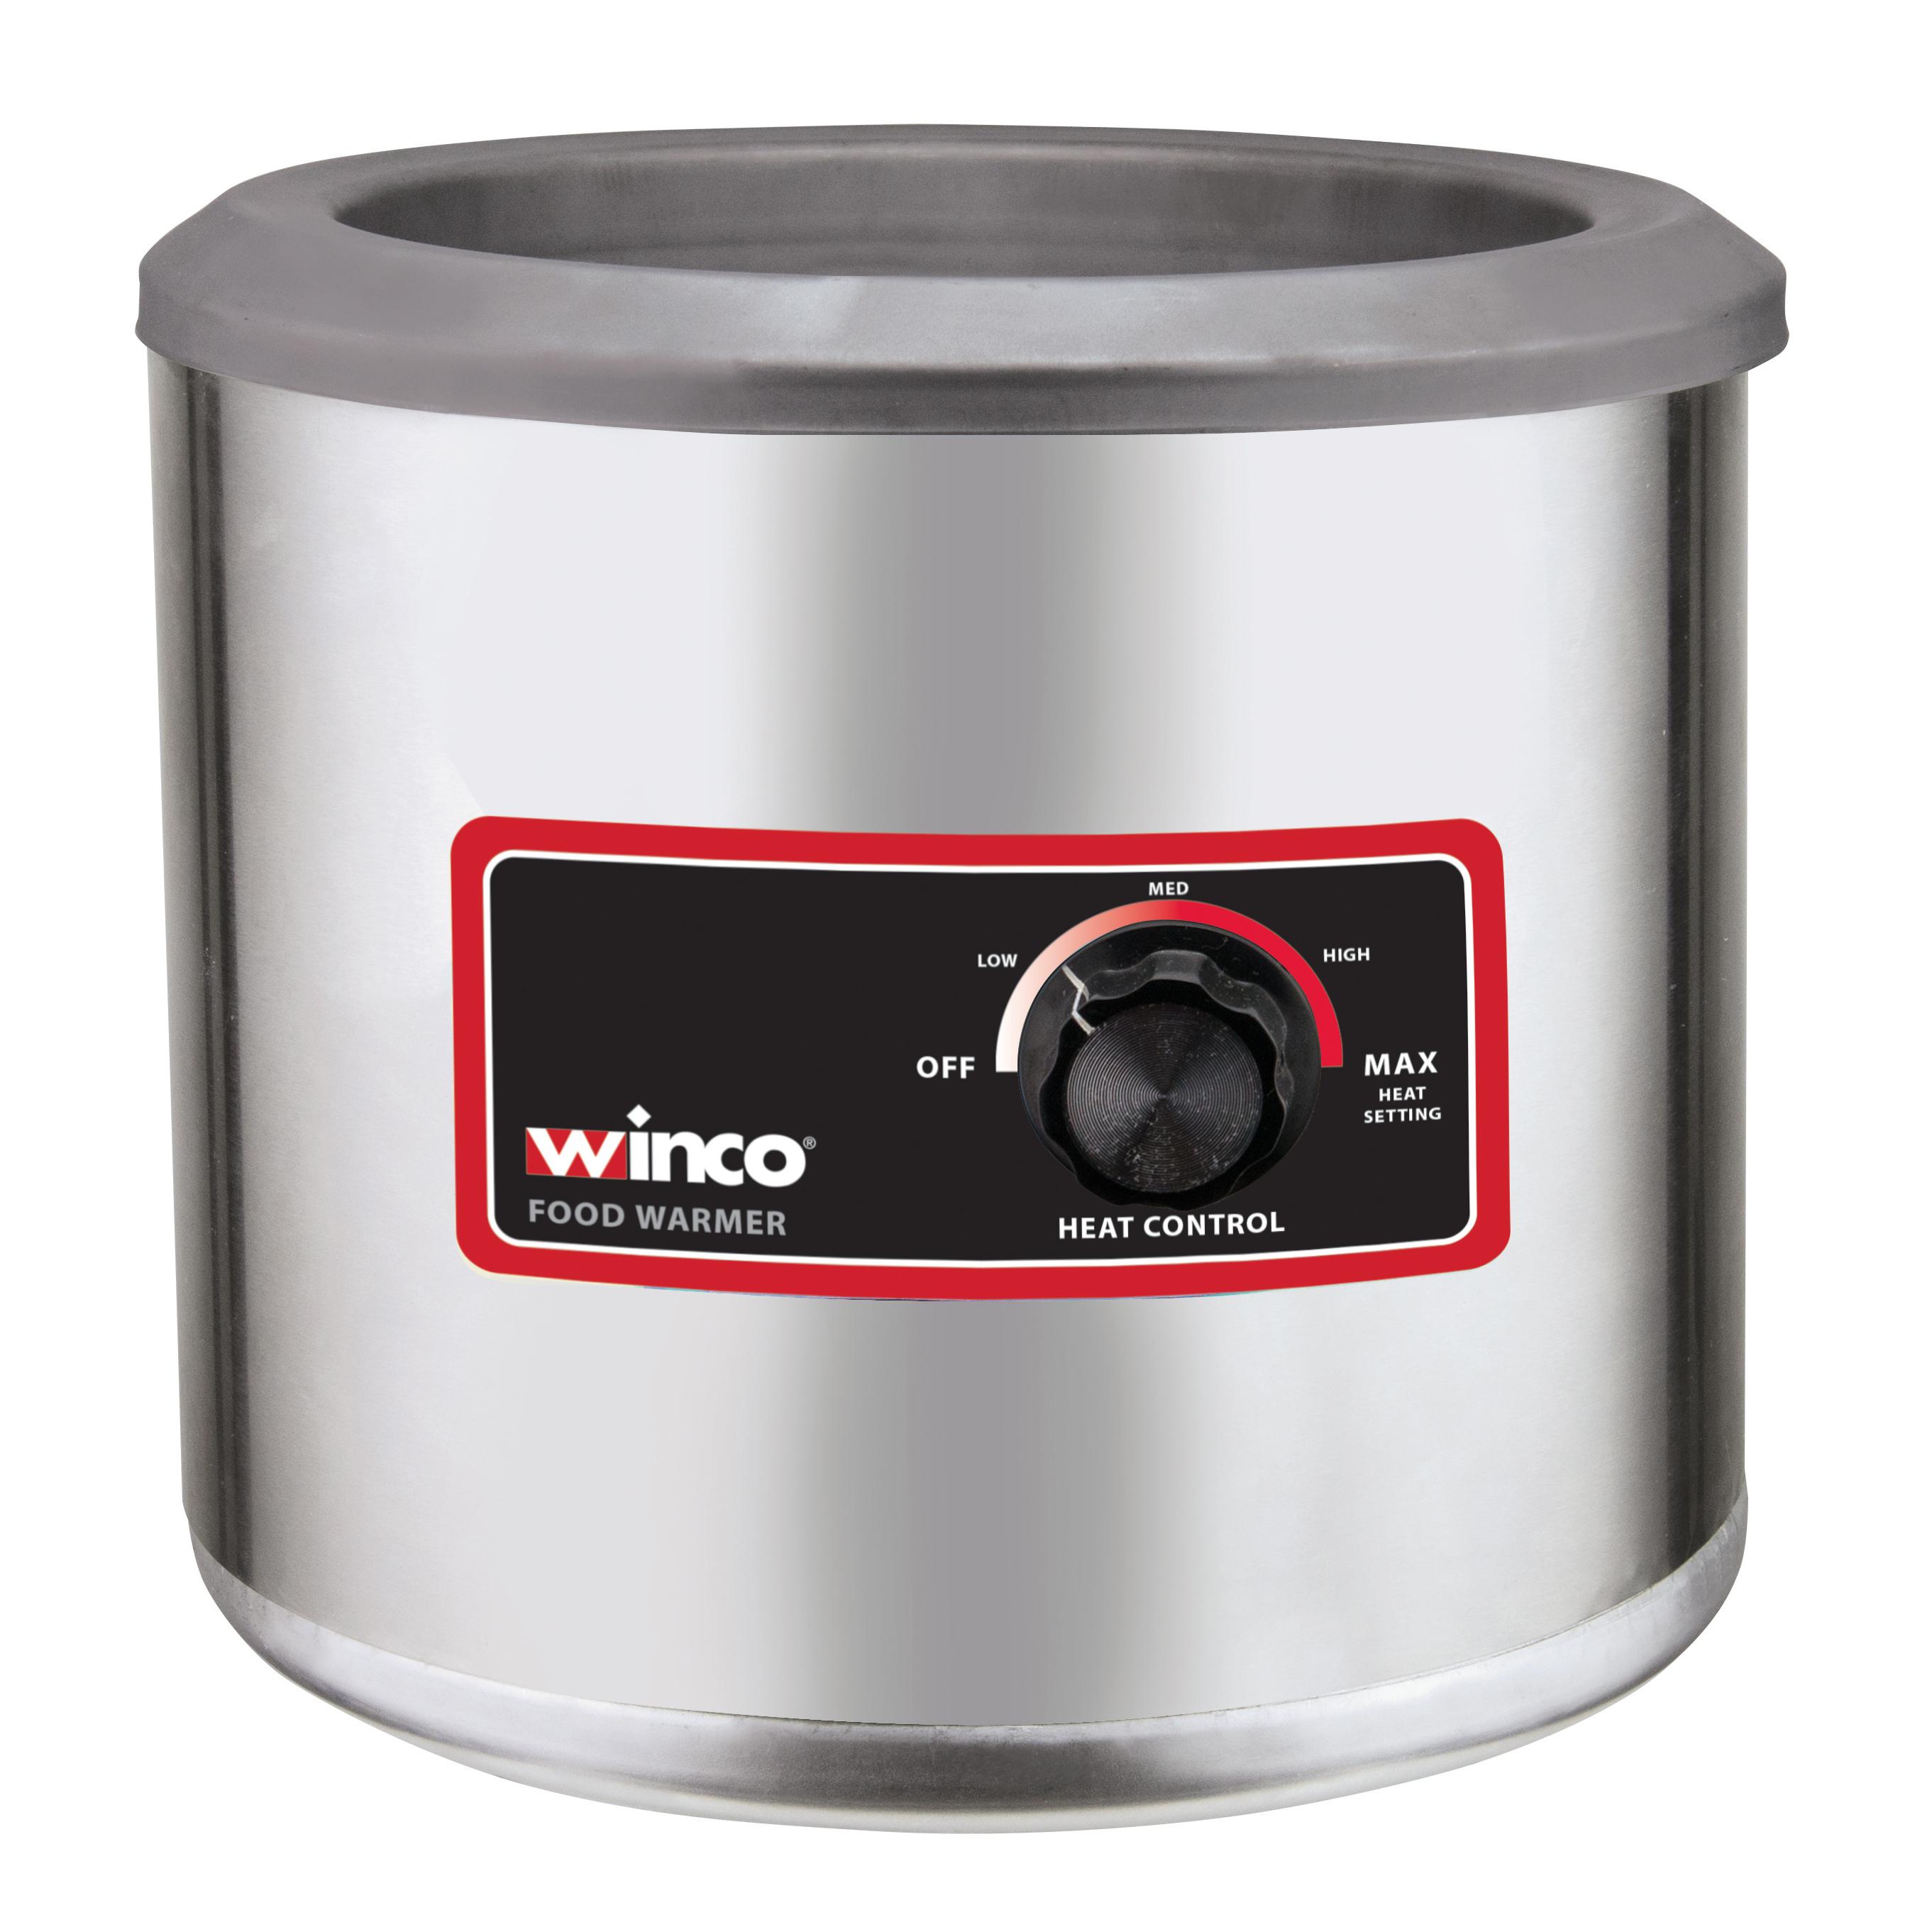 Winco FW-7R250 food pan warmer/cooker, countertop